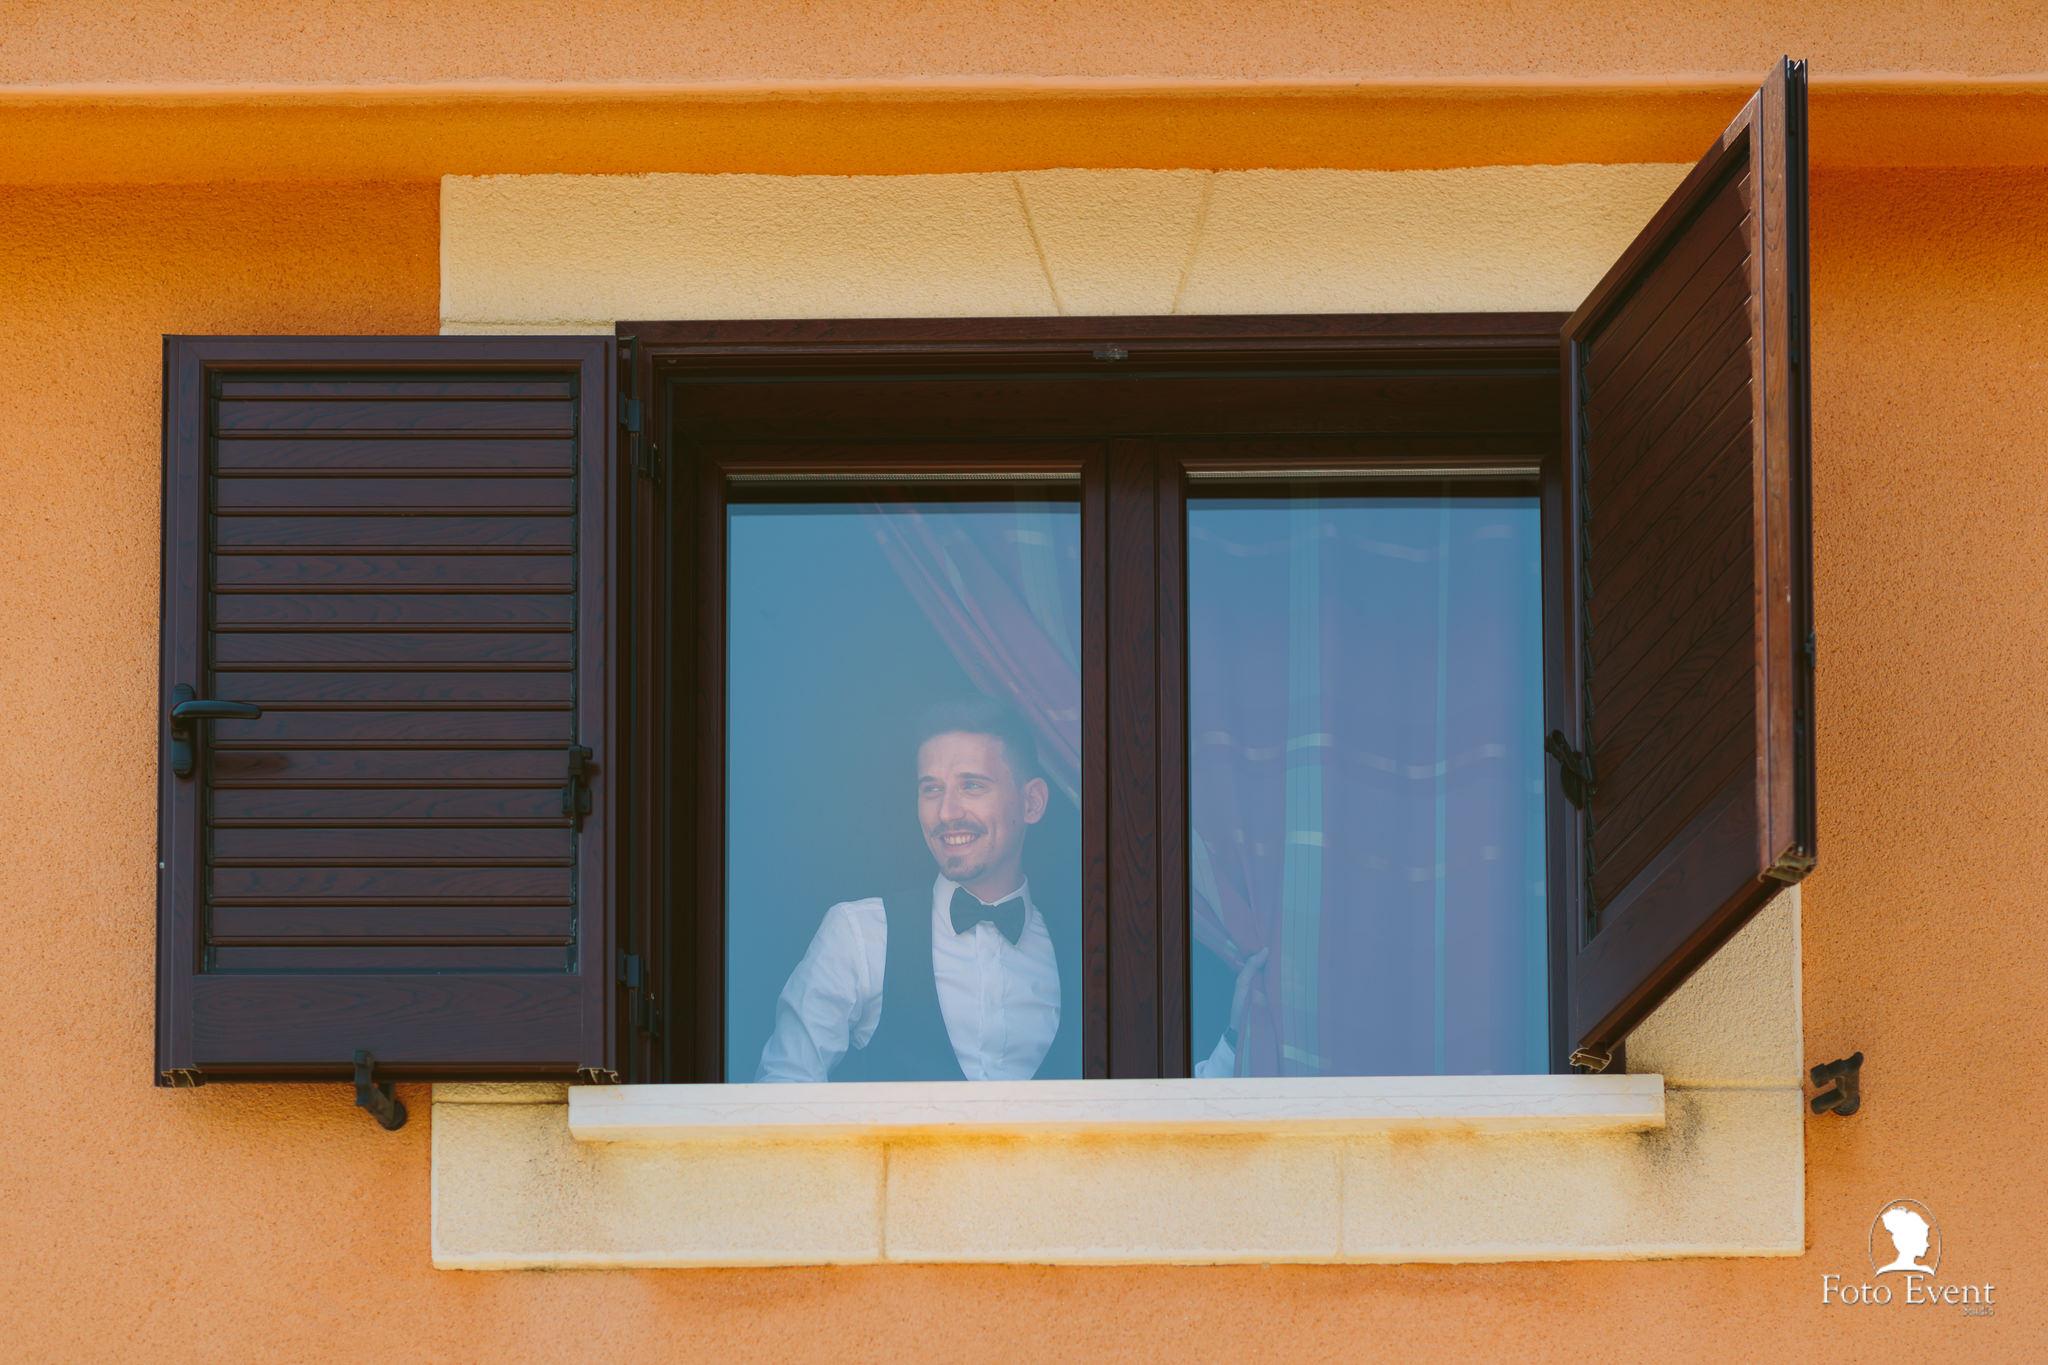 008-2019-08-22-Matrimonio-Angela-e-Nicola-Iaconis-Ric1-033